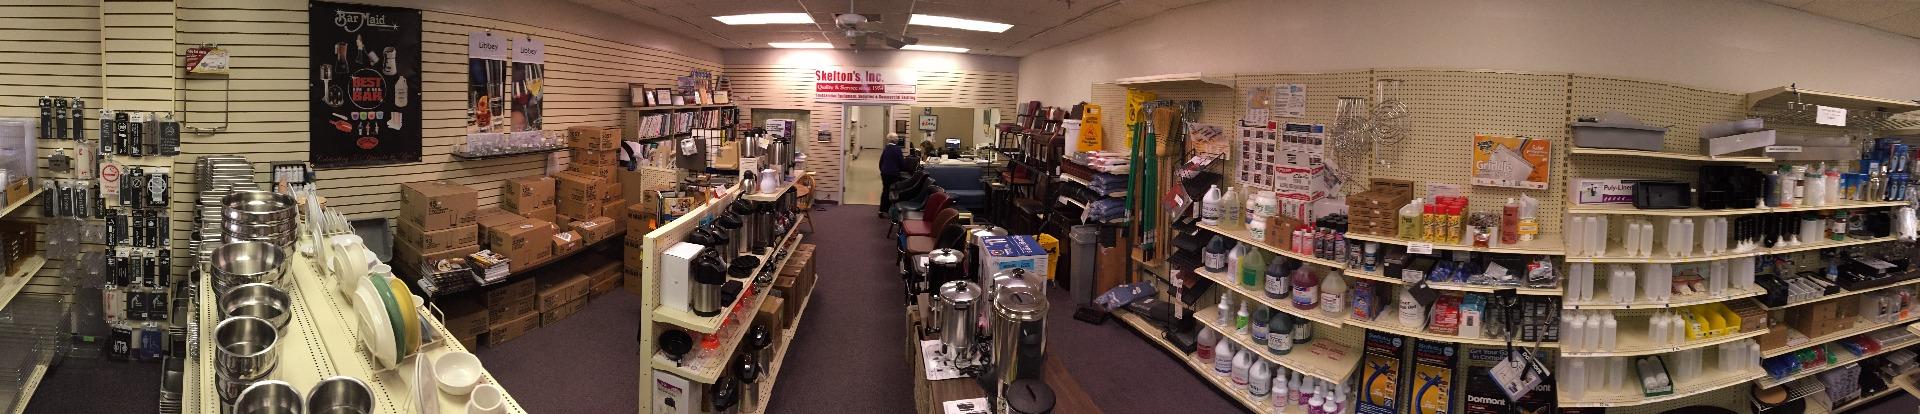 Panoramic view of Skelton's Inc. Foodservice Equipment's showroom